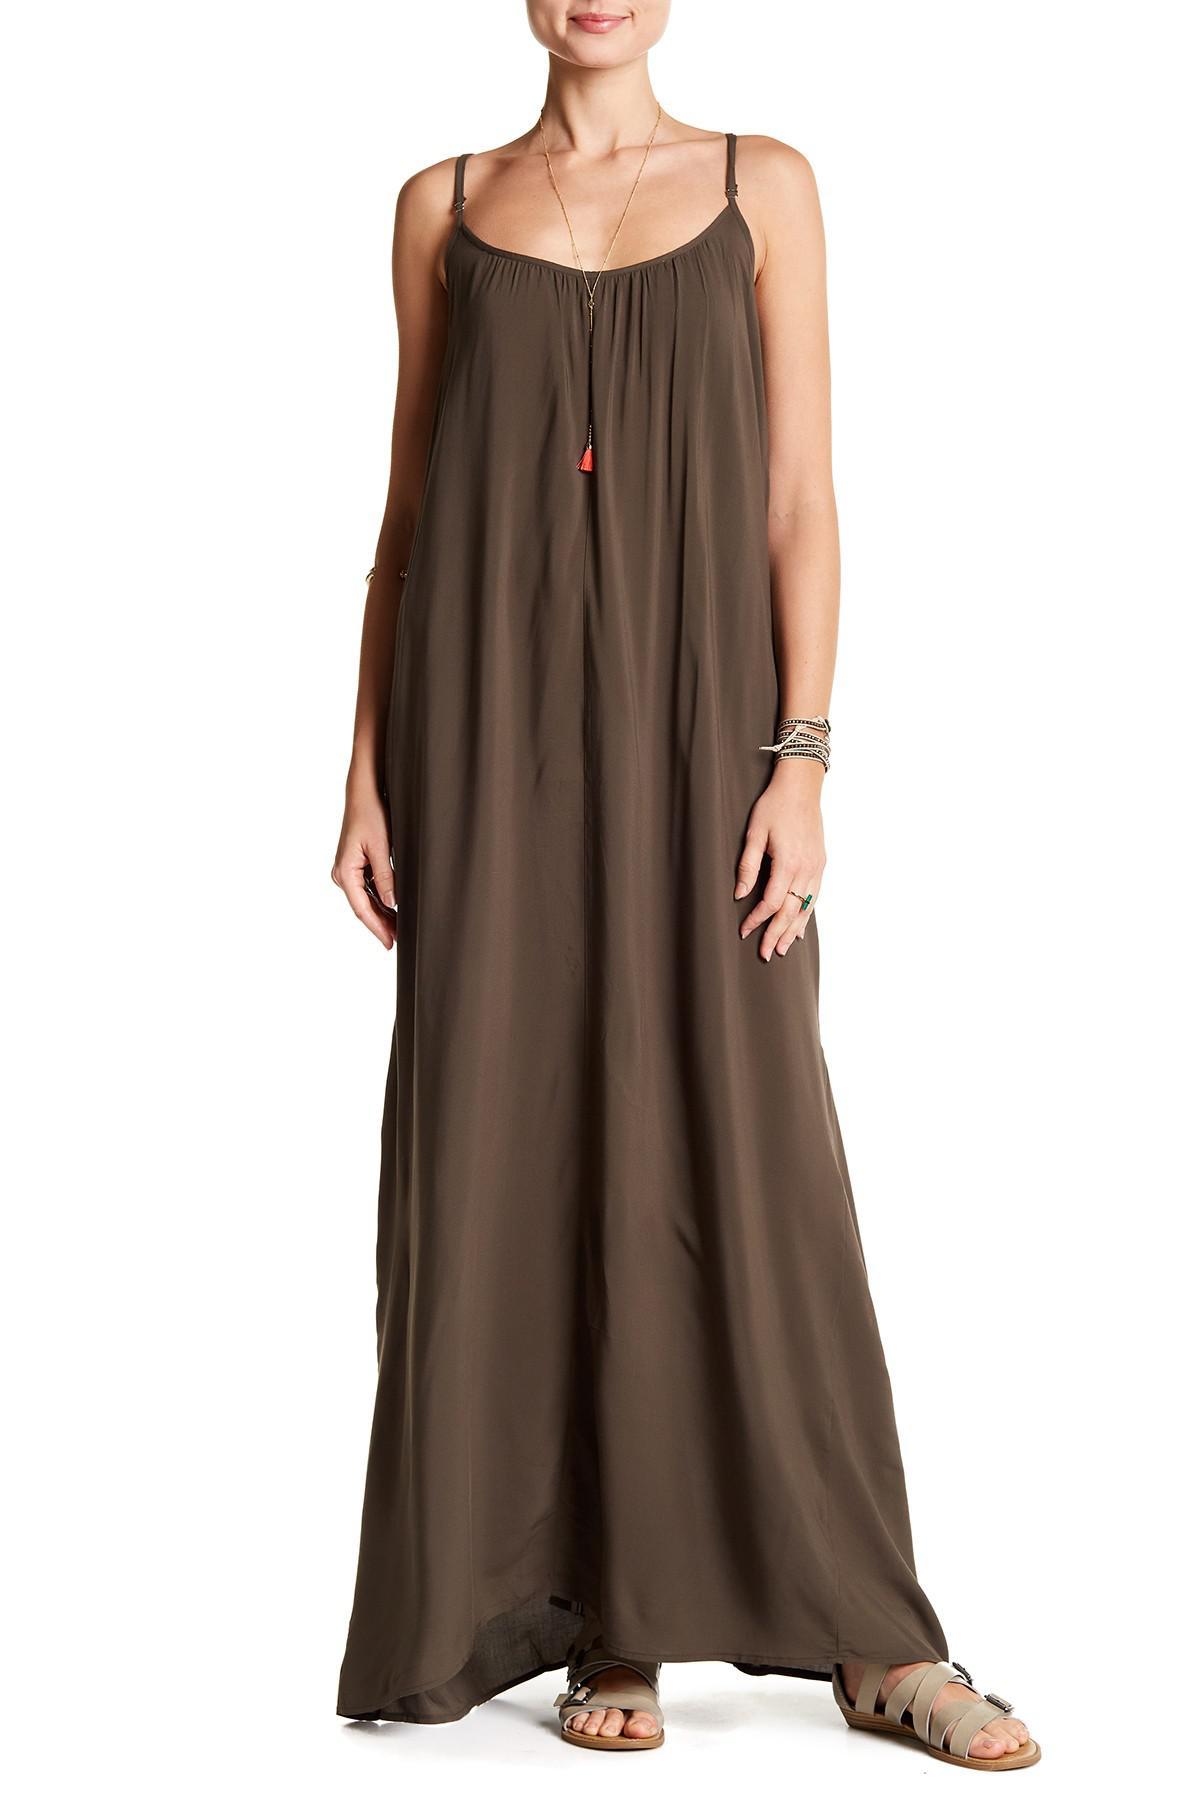 b7513ac549 Lyst - Love Stitch Challis Strappy Maxi Dress in Green